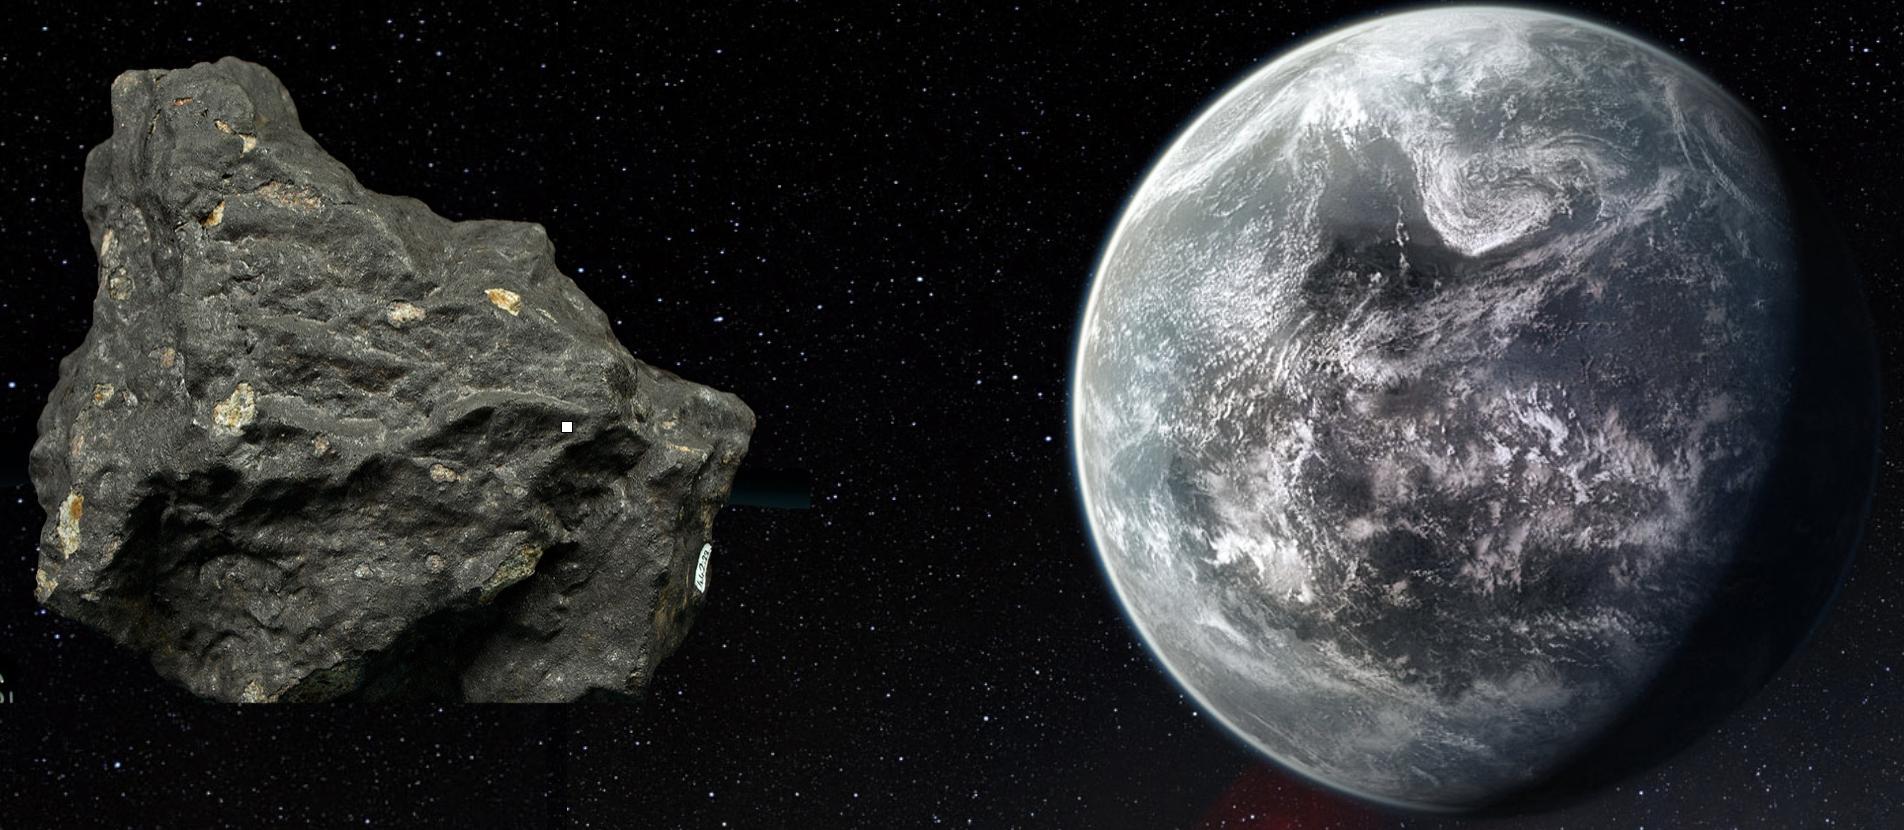 Image Credit: NASA, Svend Buhl